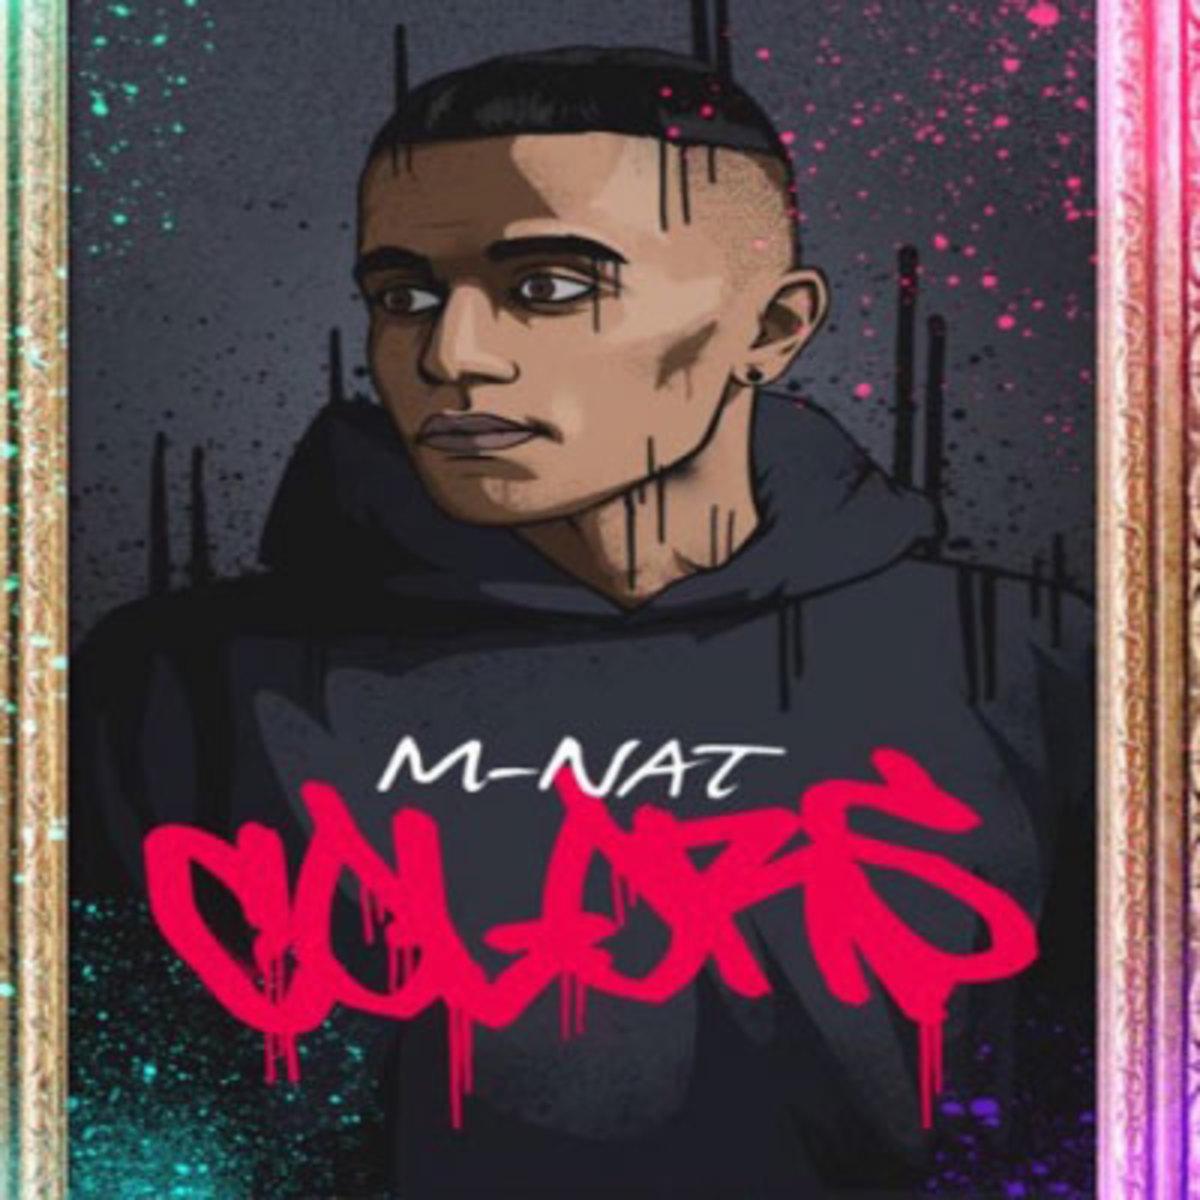 m-nat-colors.jpg